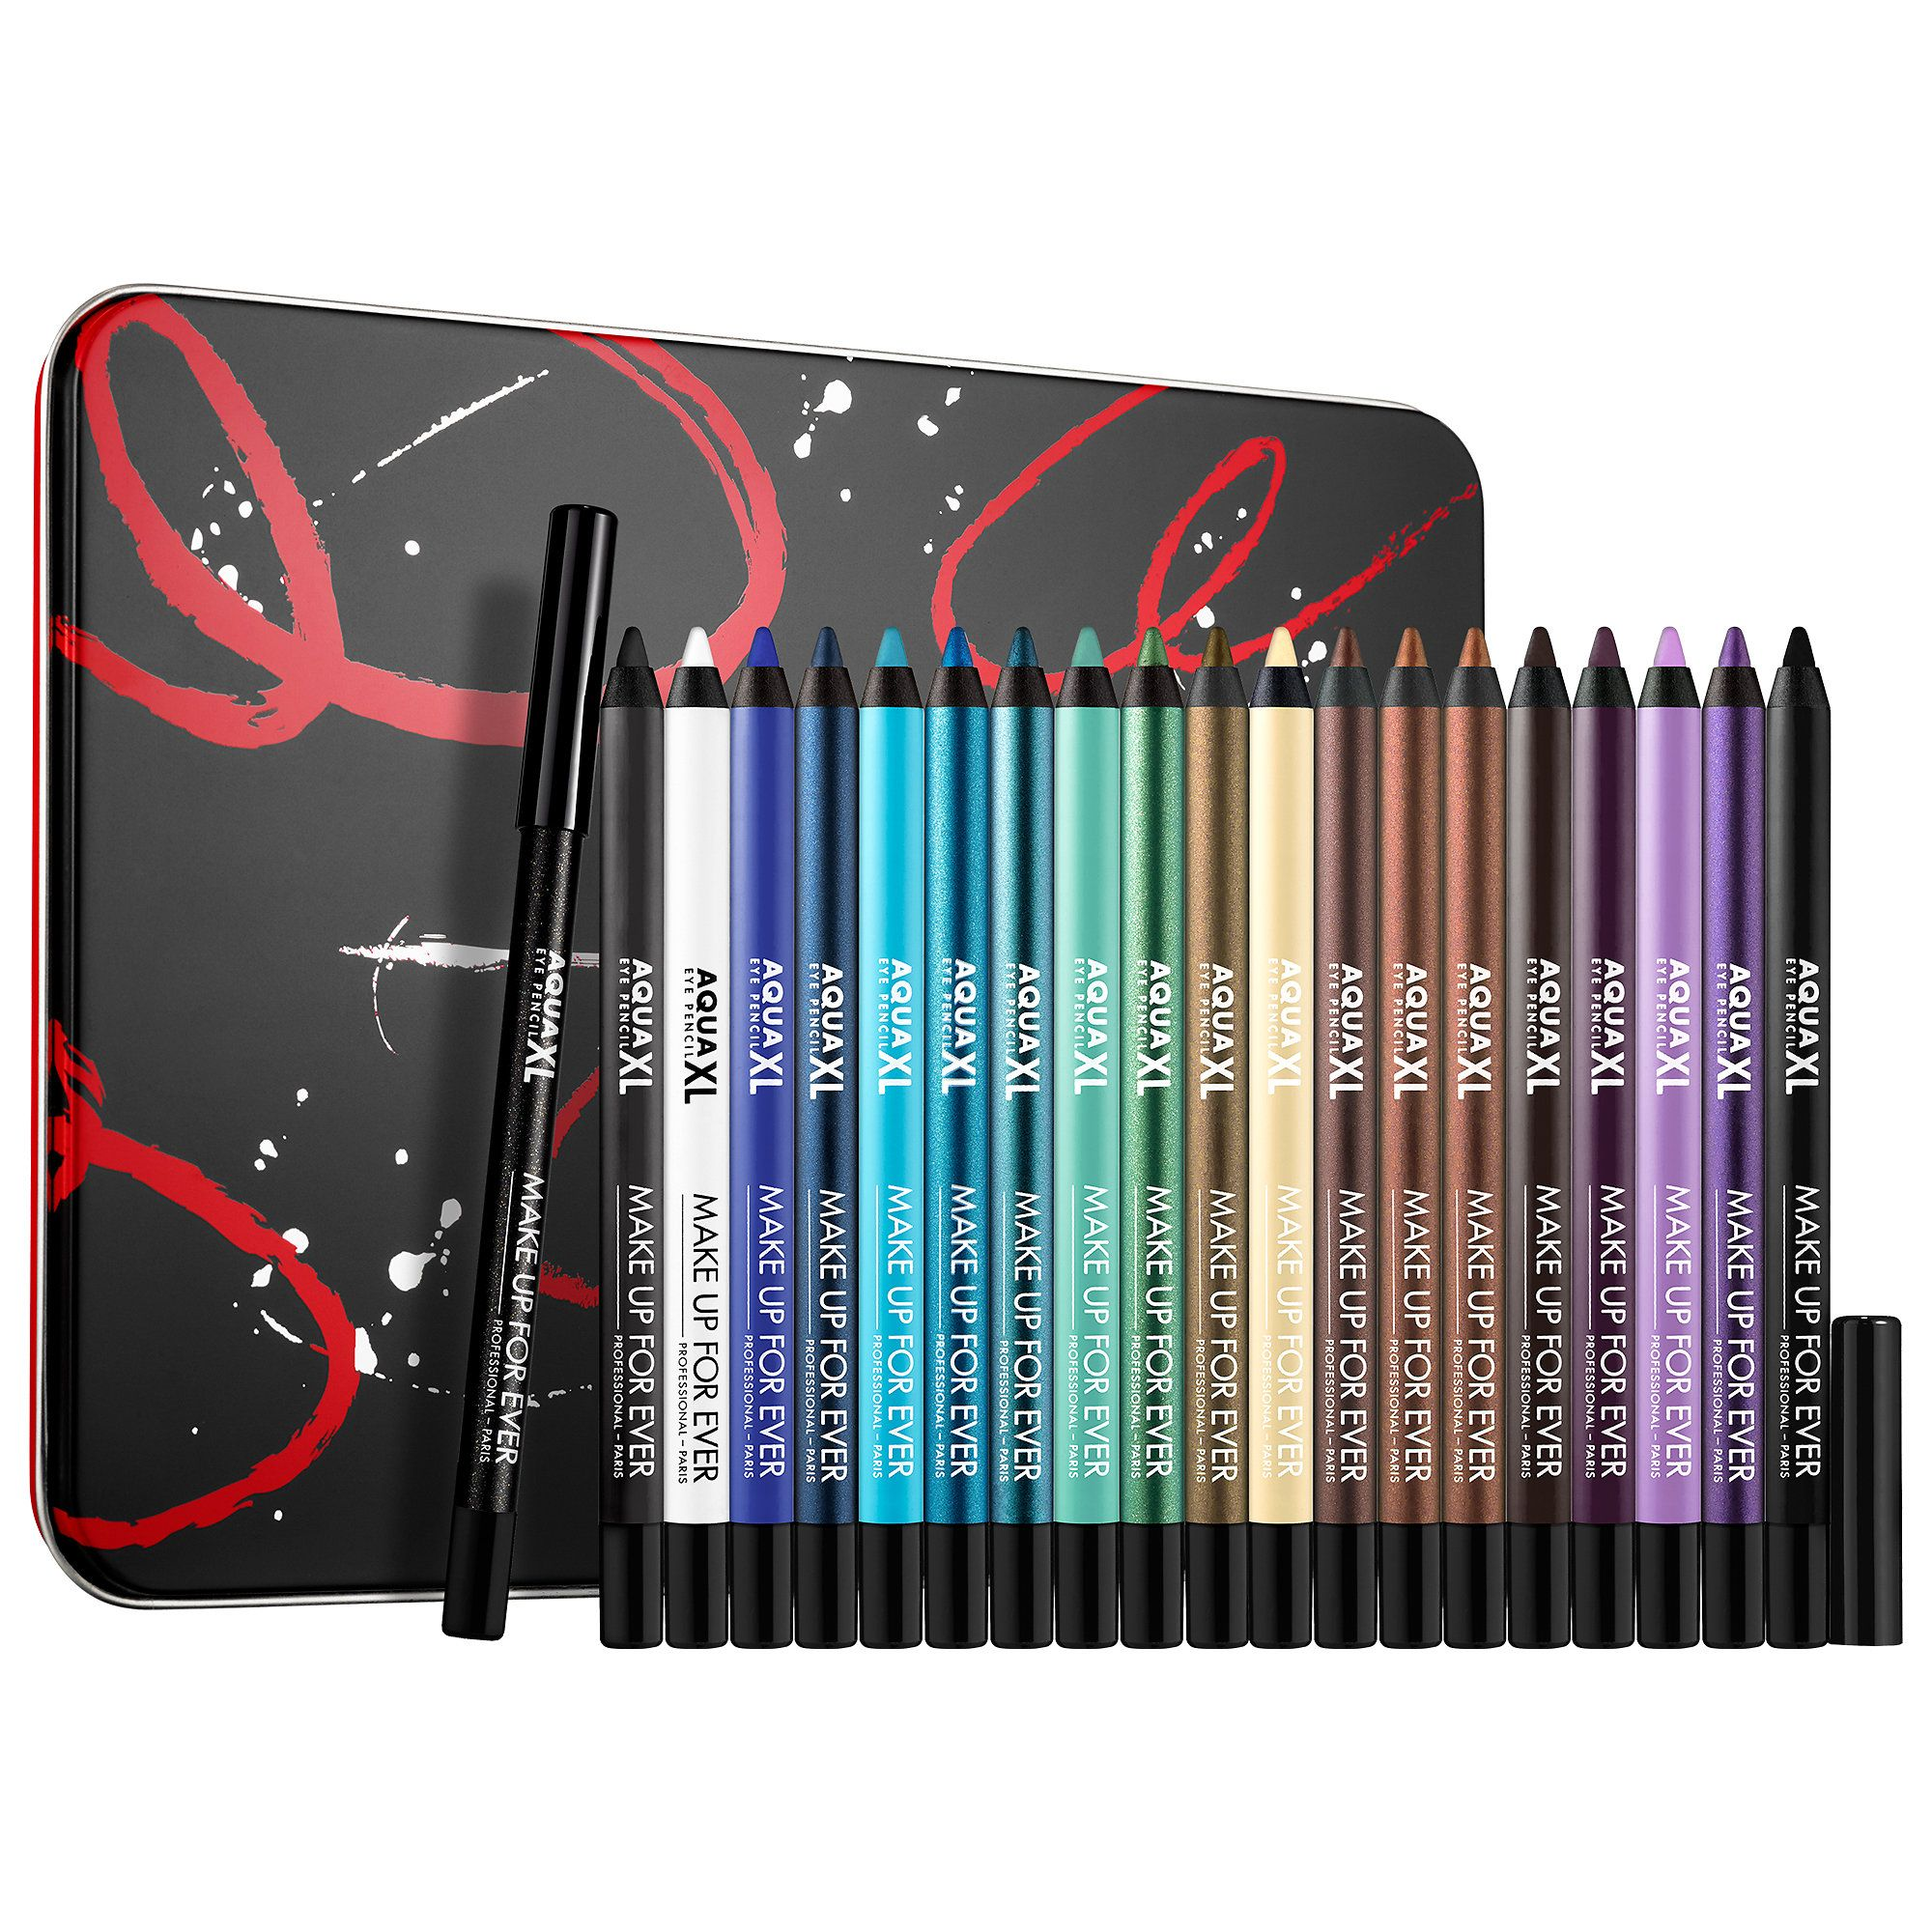 Shop MAKE UP FOR EVER's Artistic Aqua XL Eye Pencil